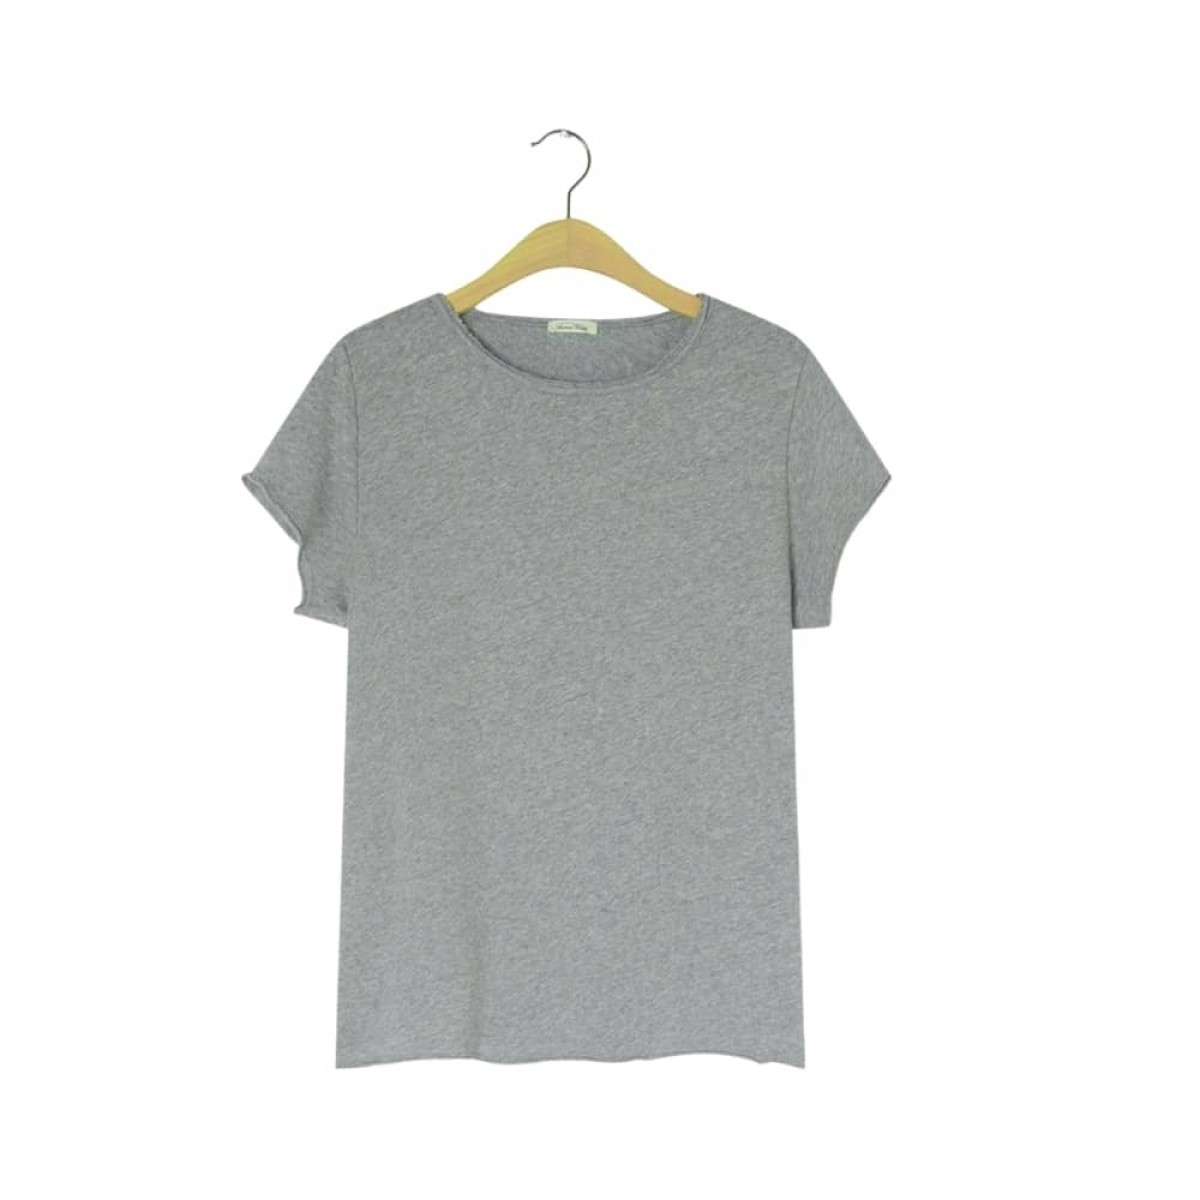 sonoma t-shirt - heather grey